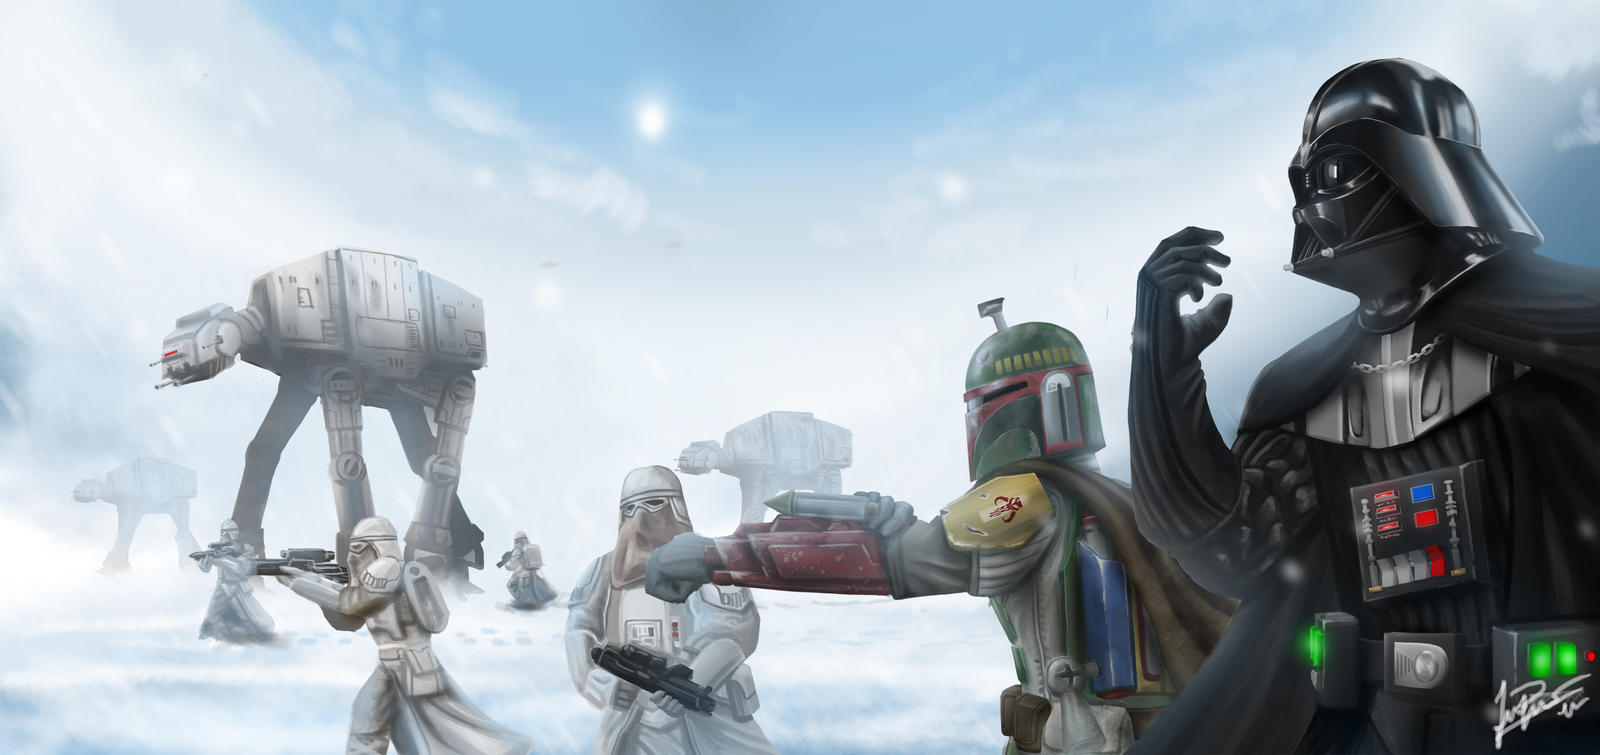 Battlefront: Hoth by MnStrptrSkrn